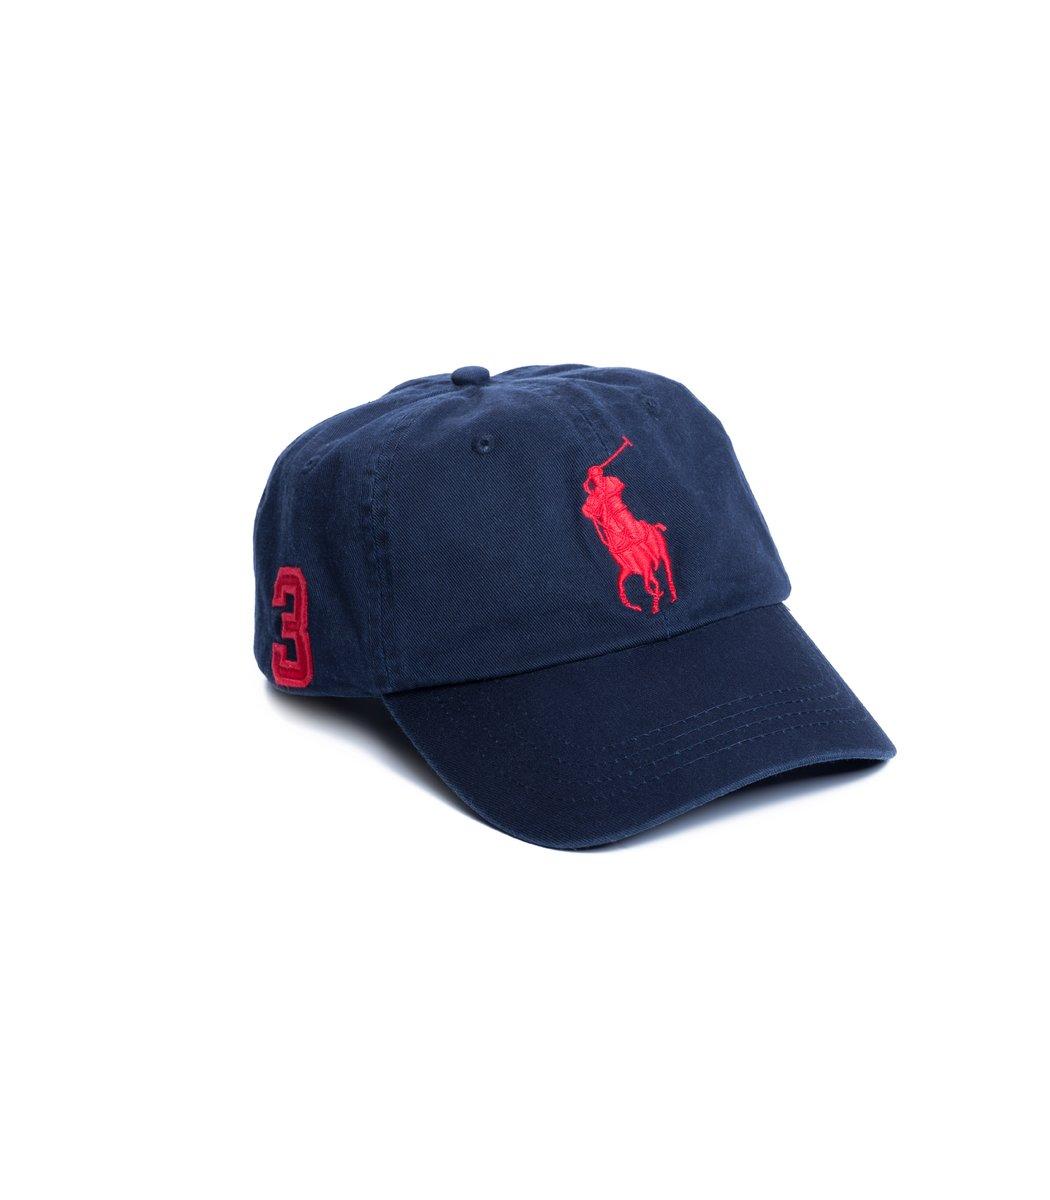 Кепка POLO Ralph Lauren Classic 3 Тёмно-синий/красный